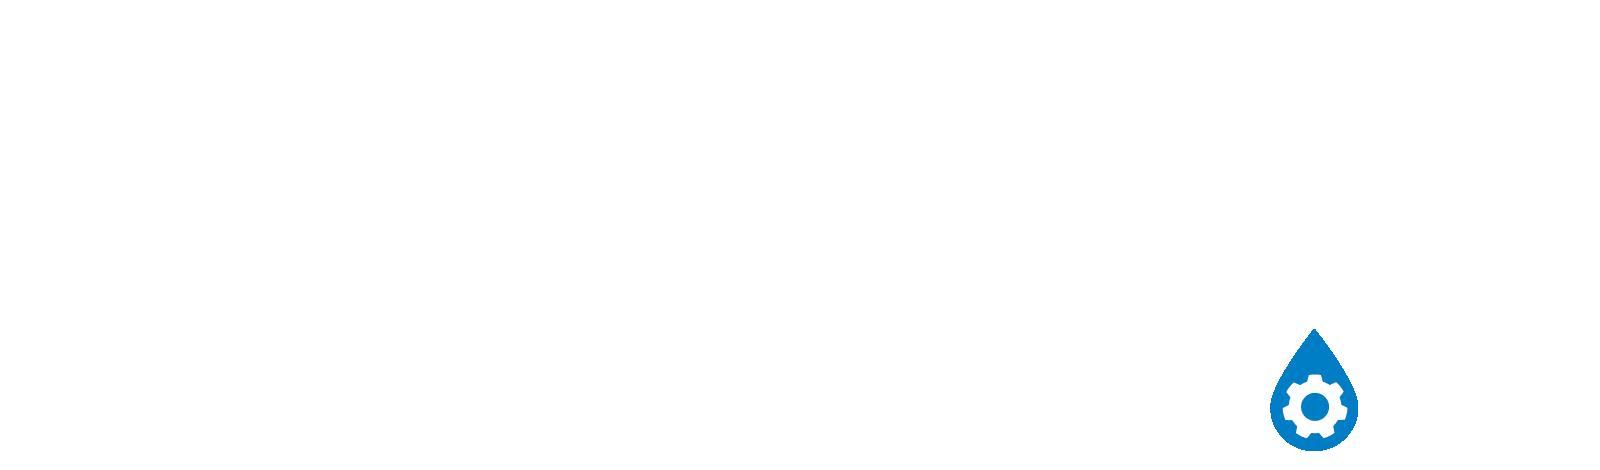 Northwest Waterjet logo icon